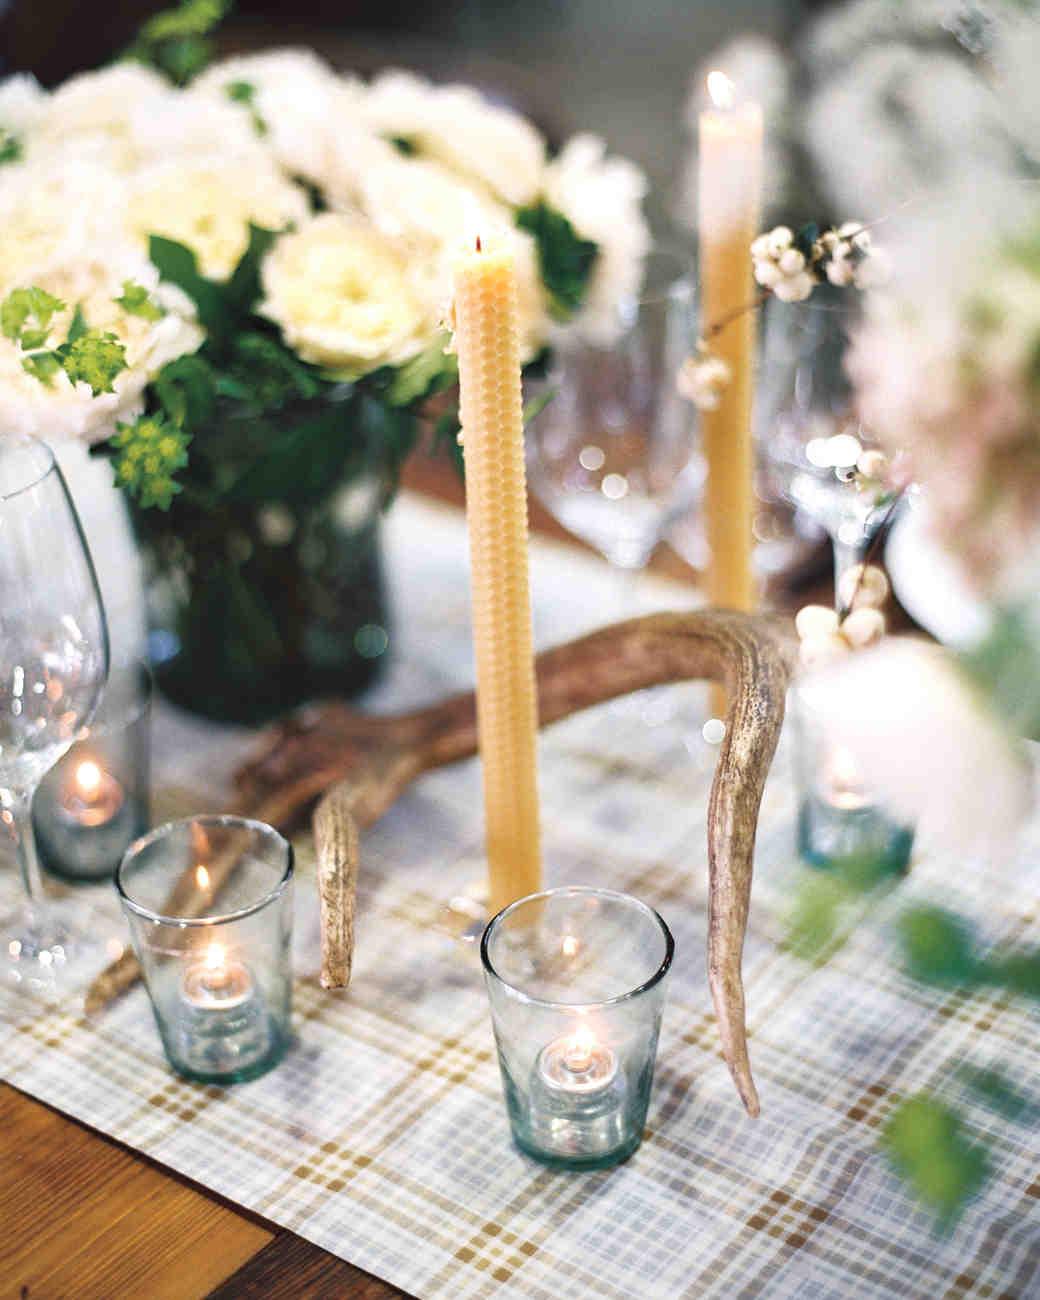 Bon 14 Ideas That Prove Antlers Make Awesome Wedding Décor | Martha Stewart  Weddings